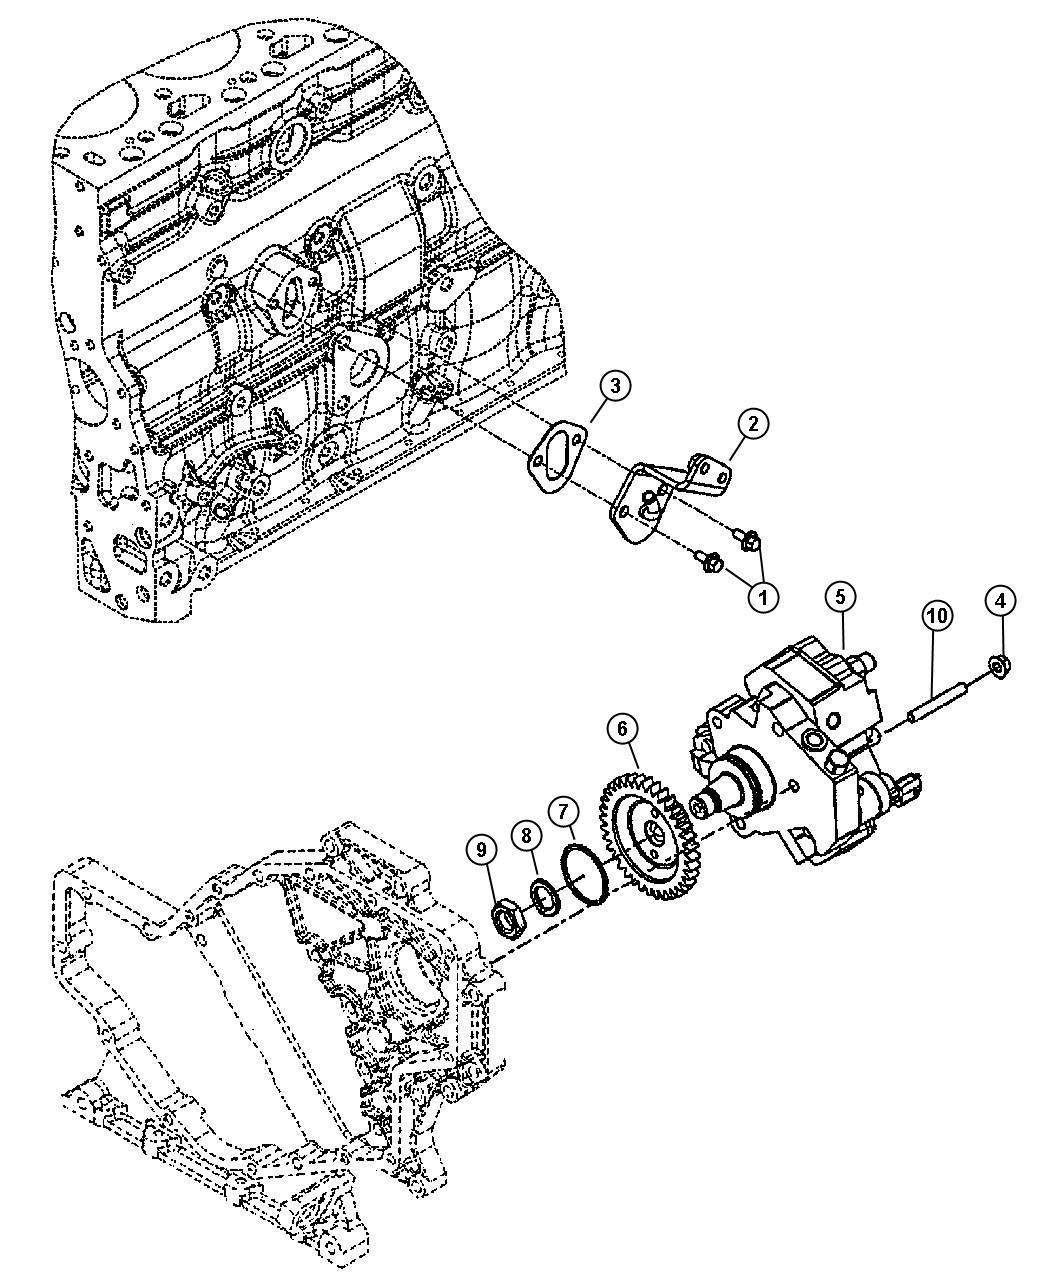 Chevrolet Equinox Water Pump Diagram Html